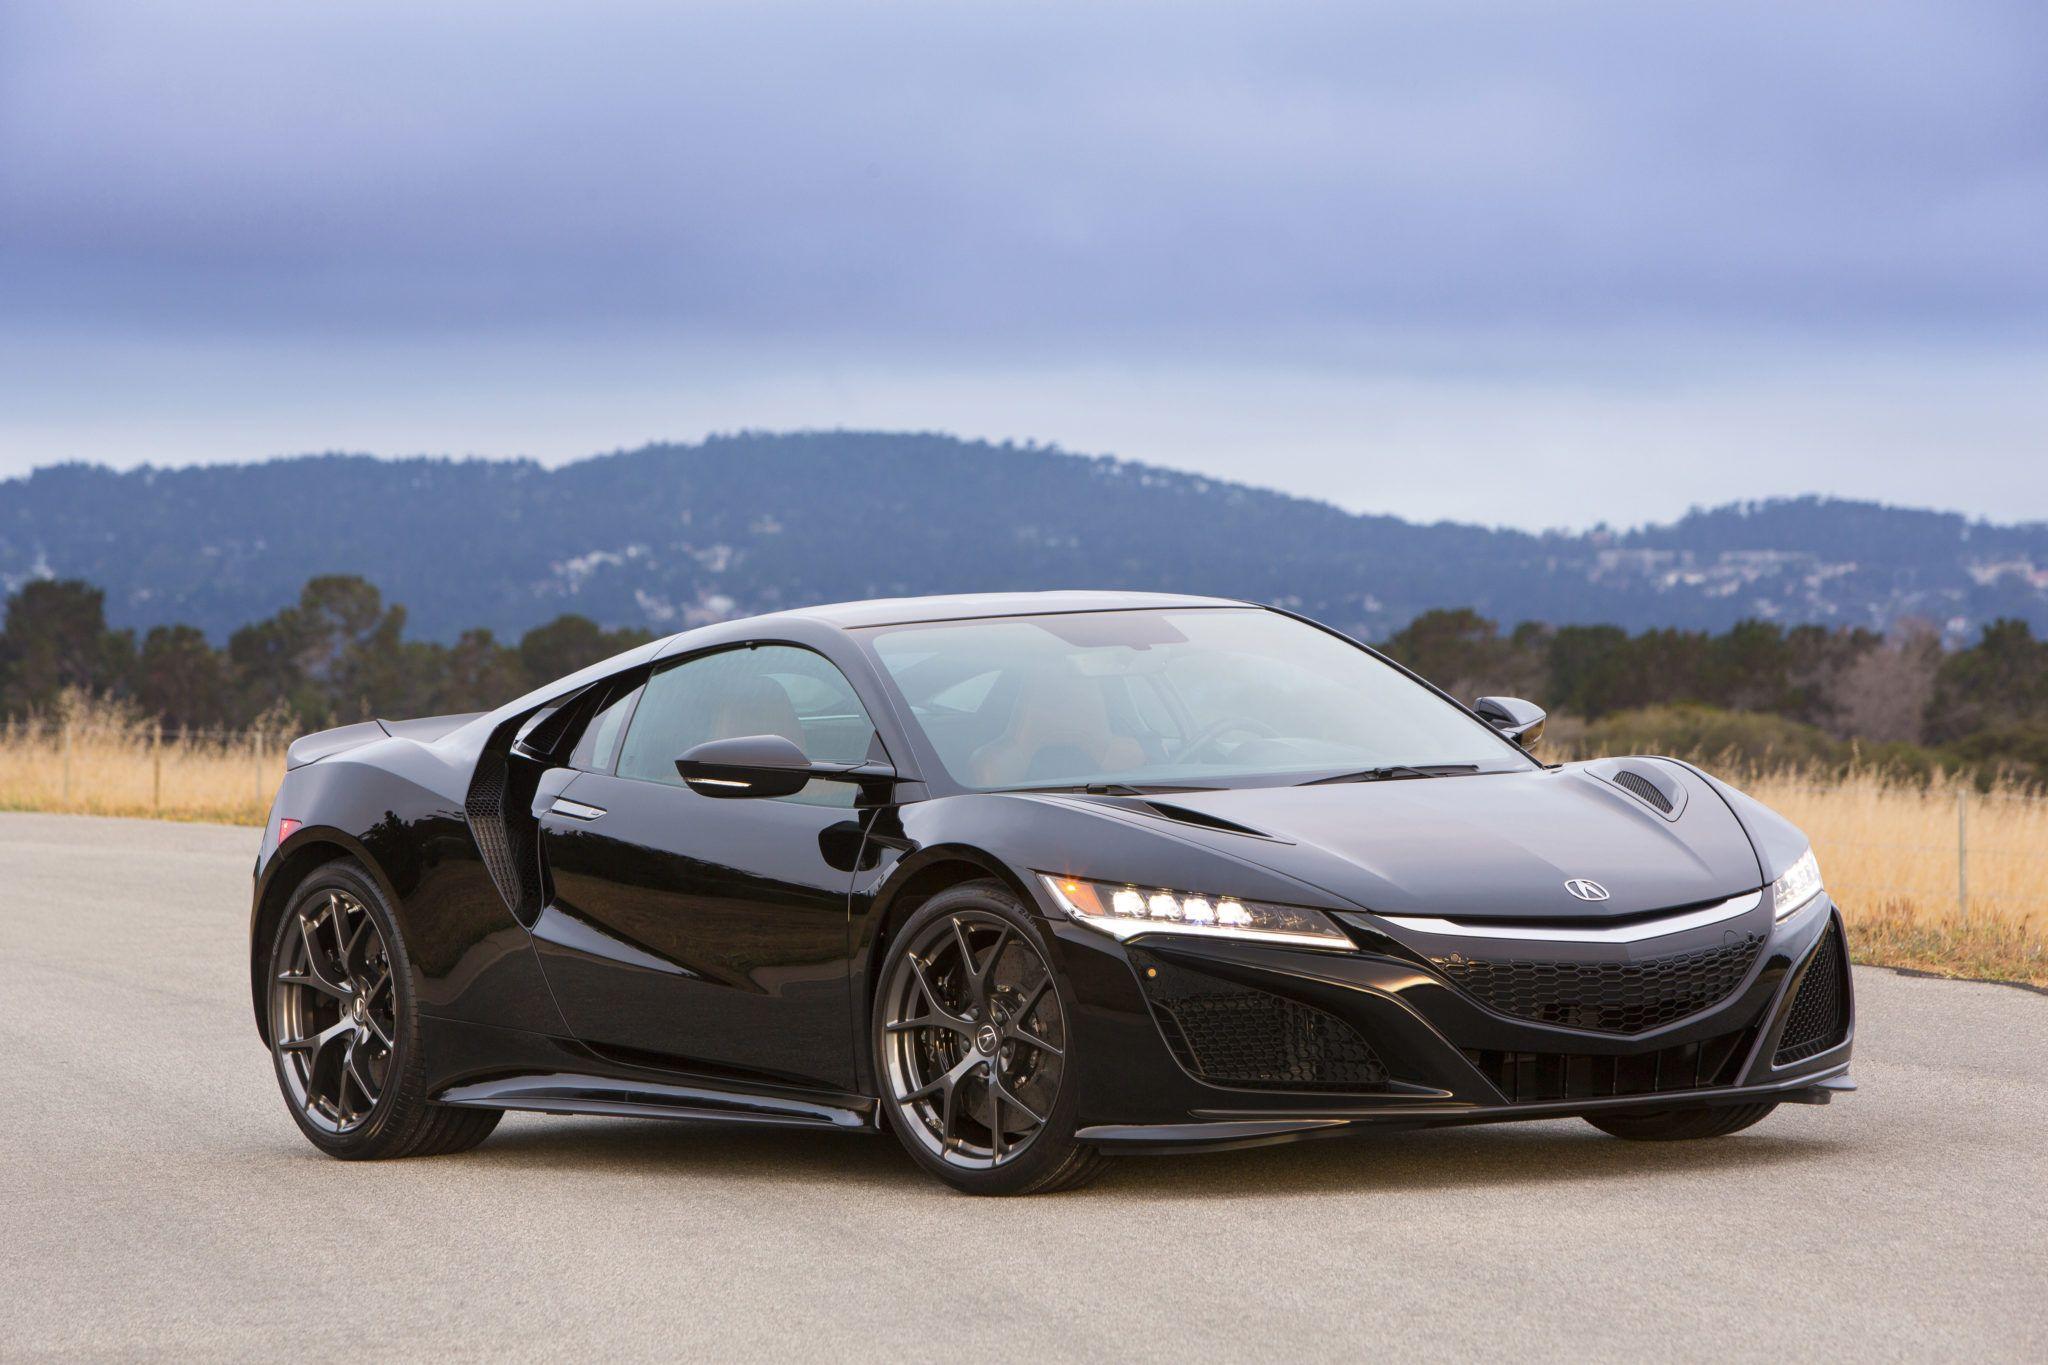 2017 honda nsx car model reviews